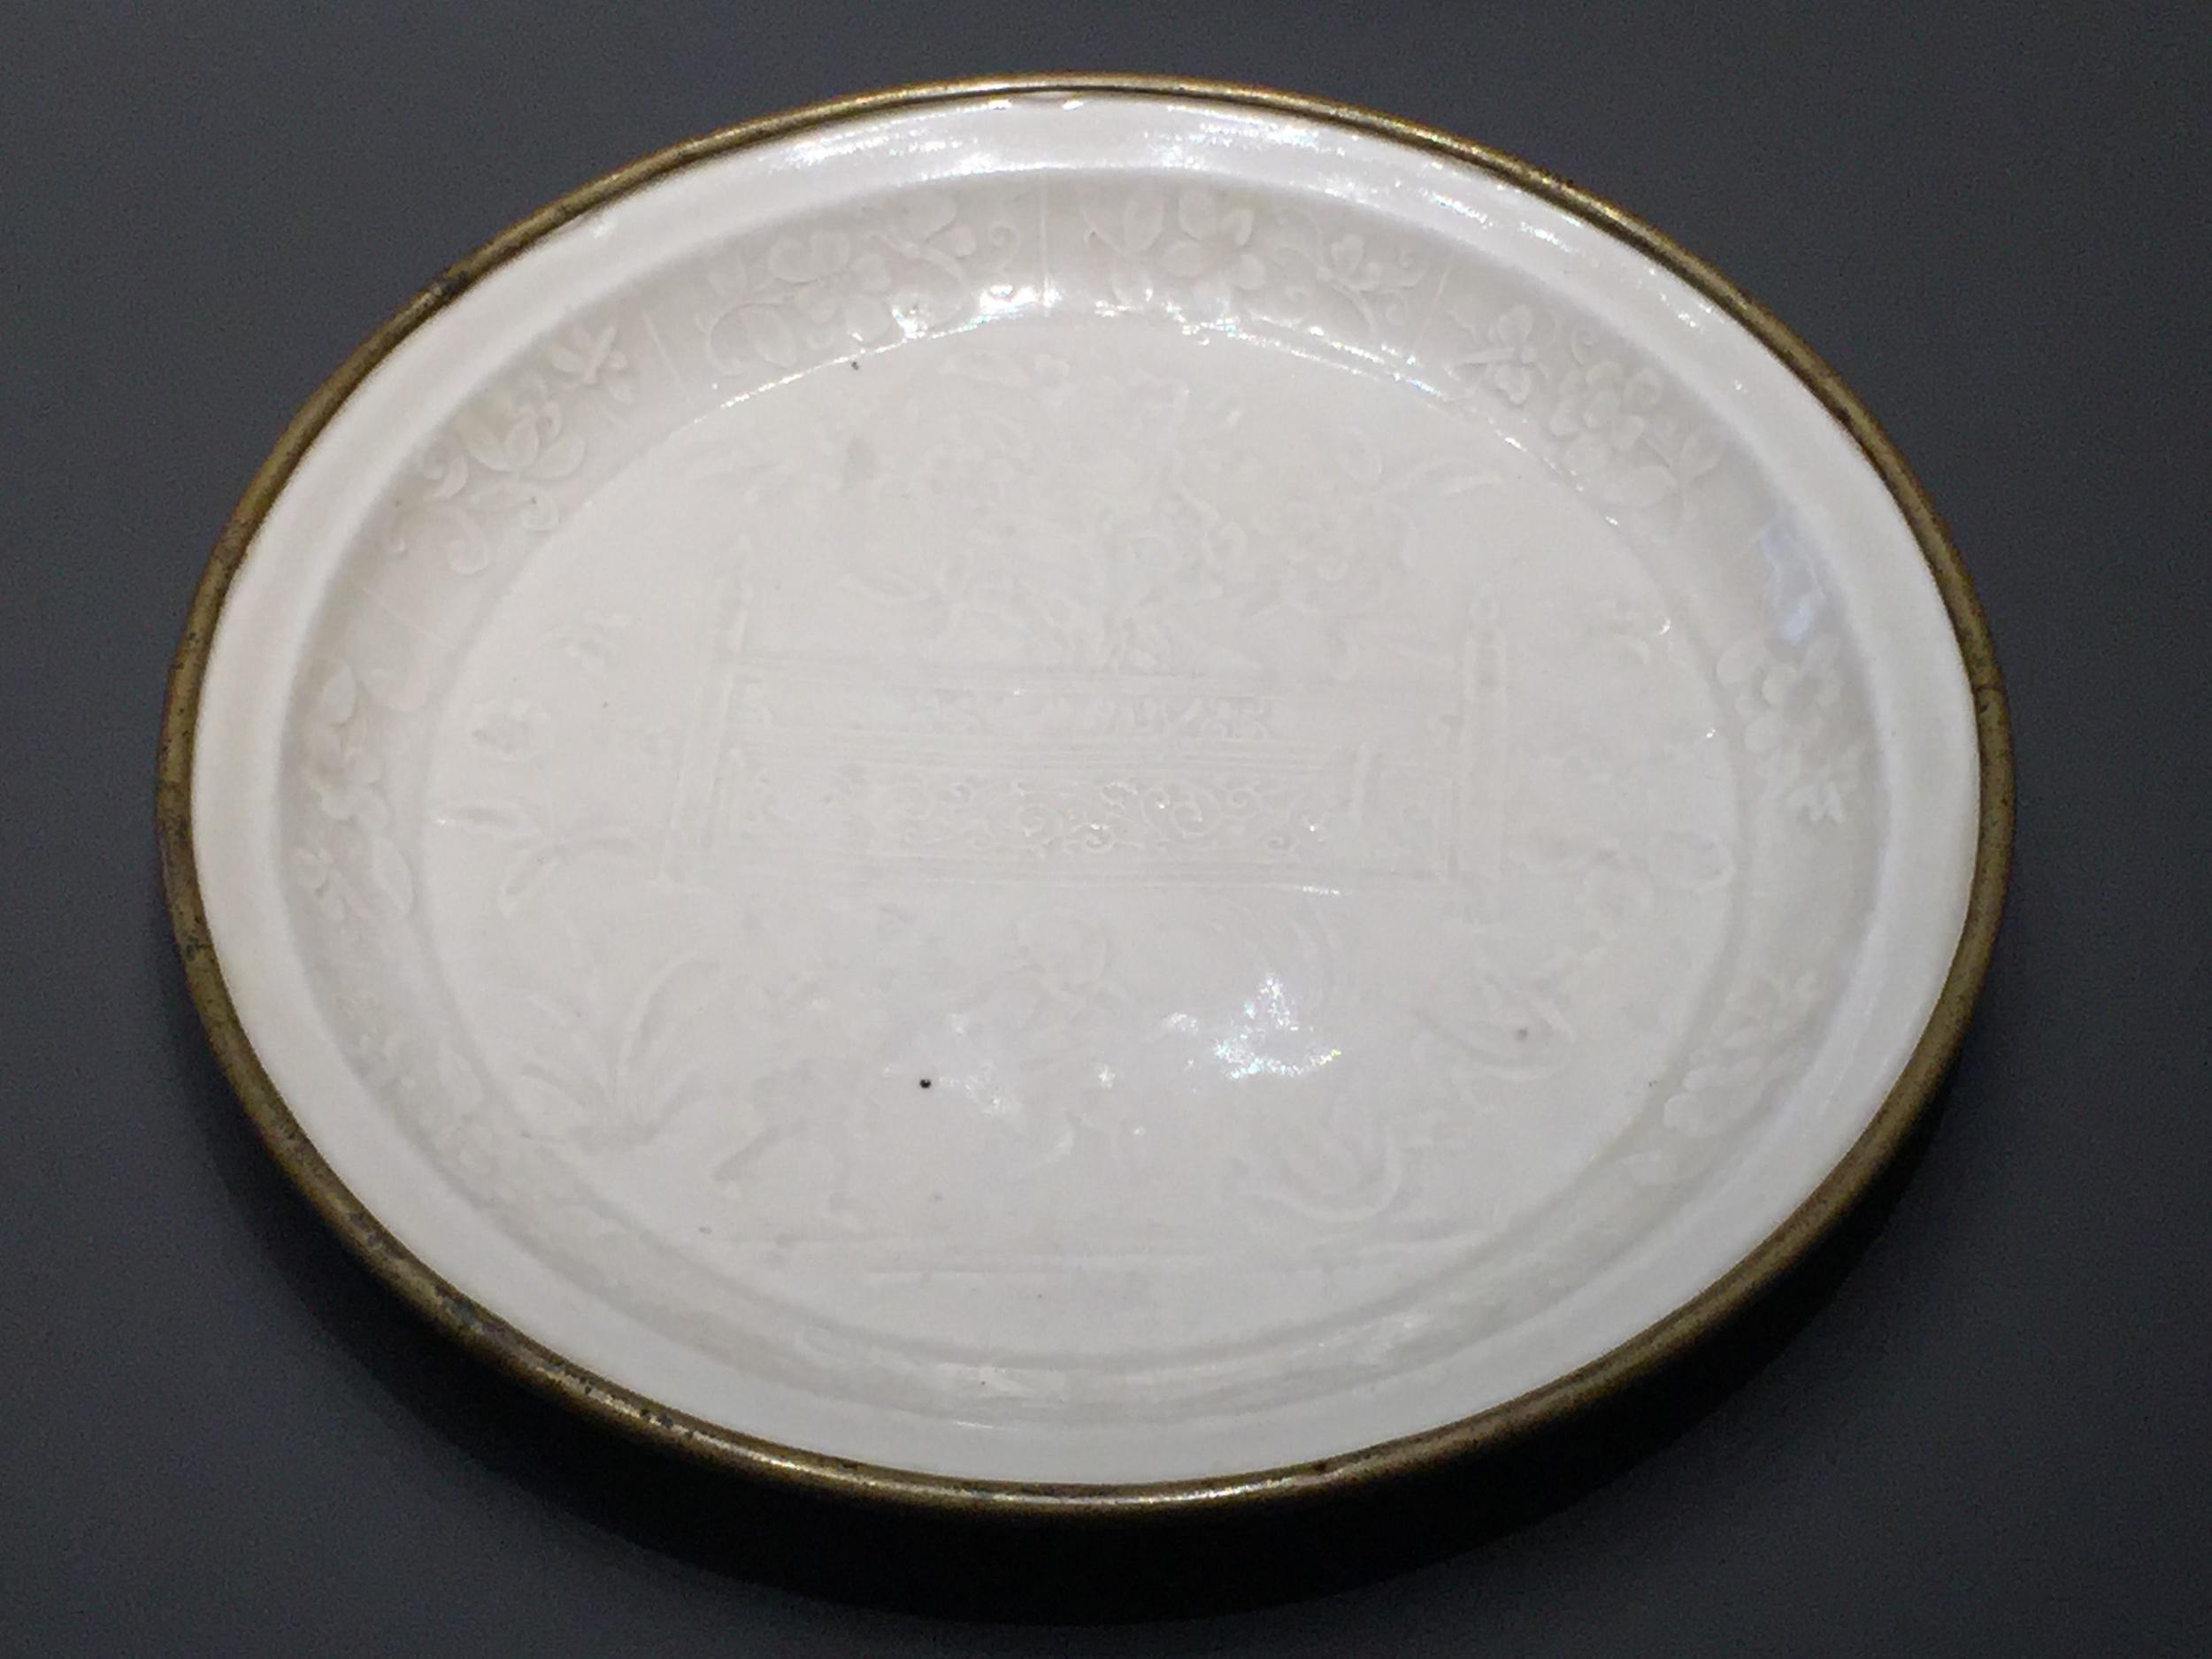 Chinese-Porcelain-British-Museum-Percival-David-jessewaugh.com-10.jpg